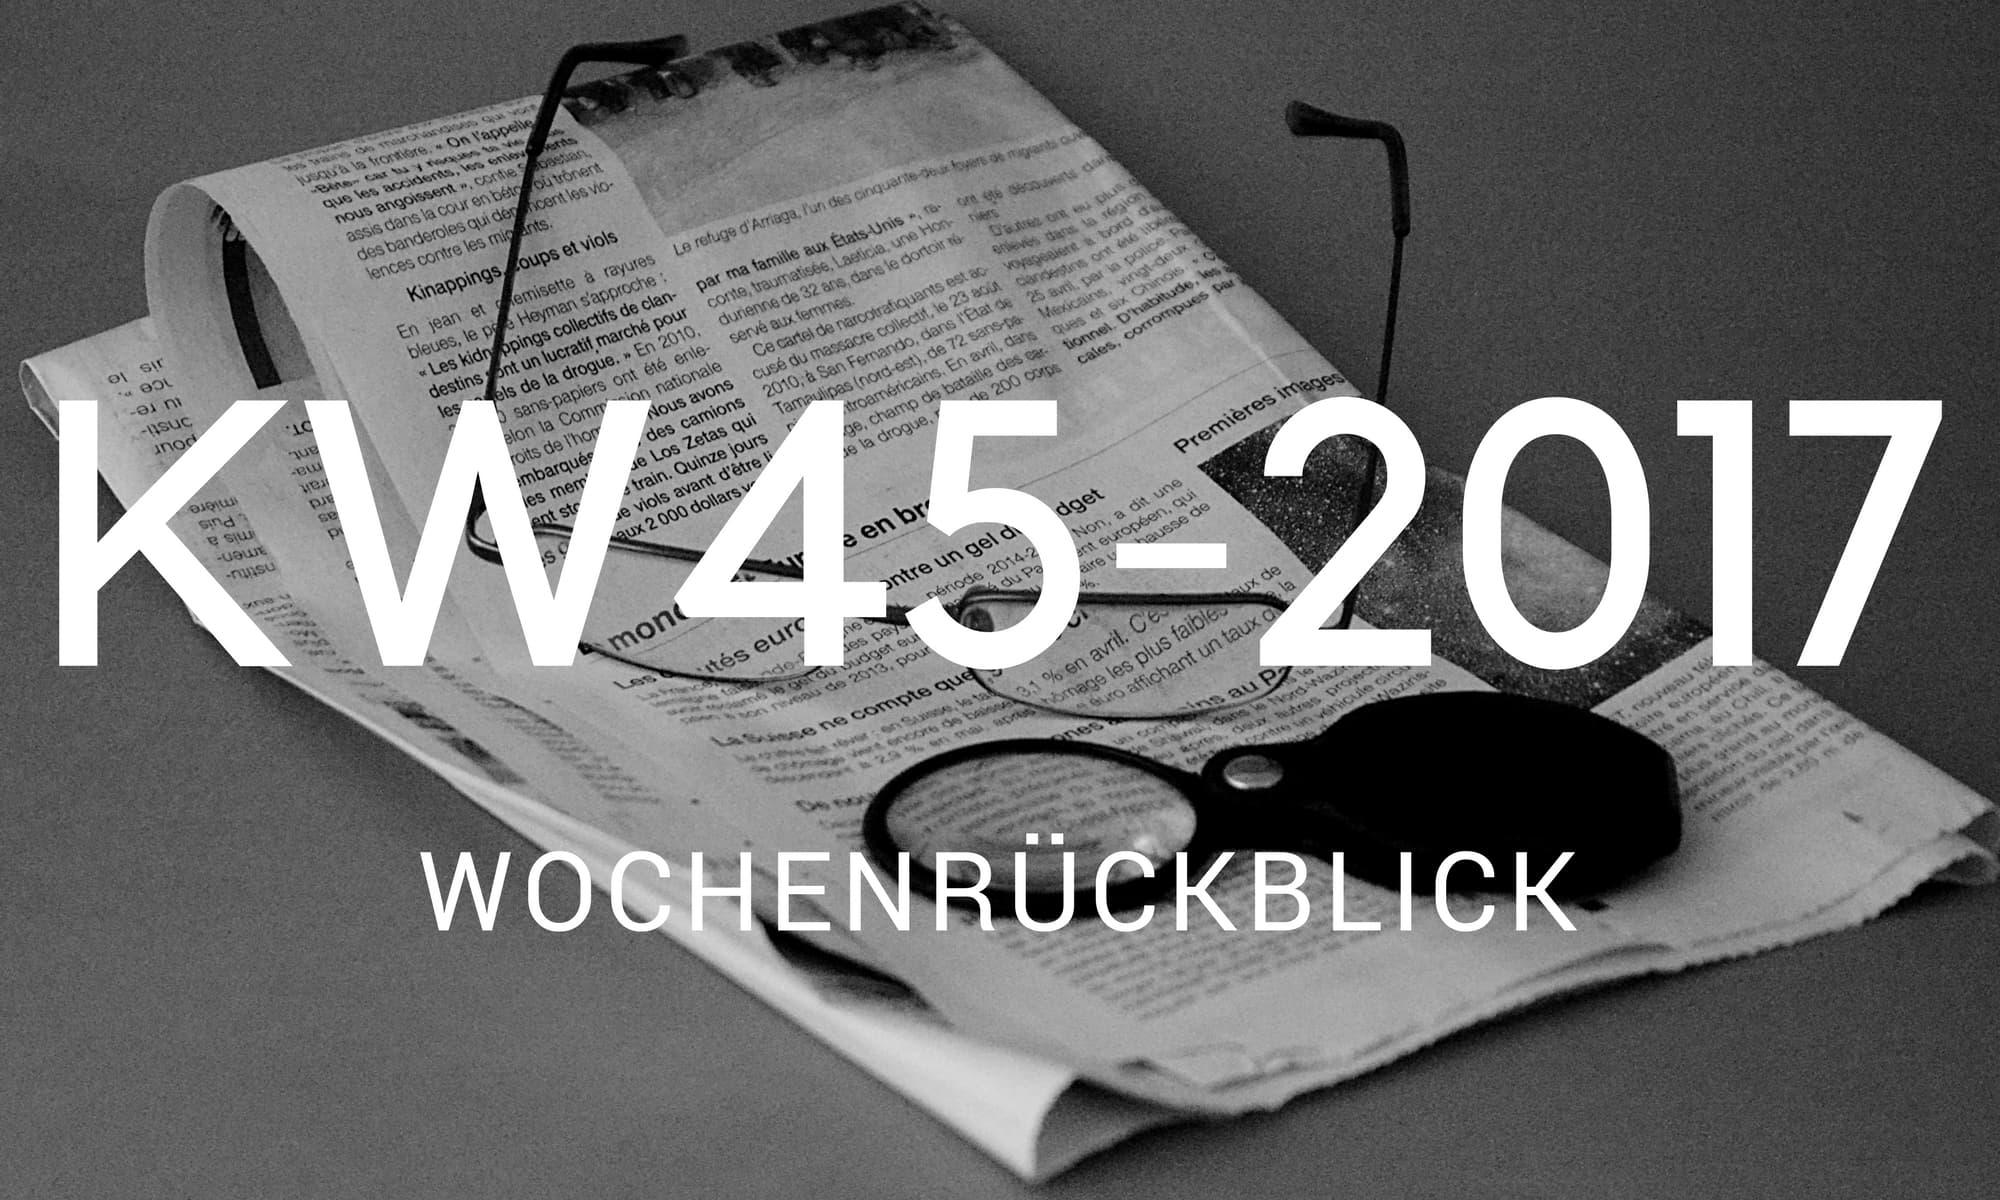 wochenrueckblick camping news KW45 2017